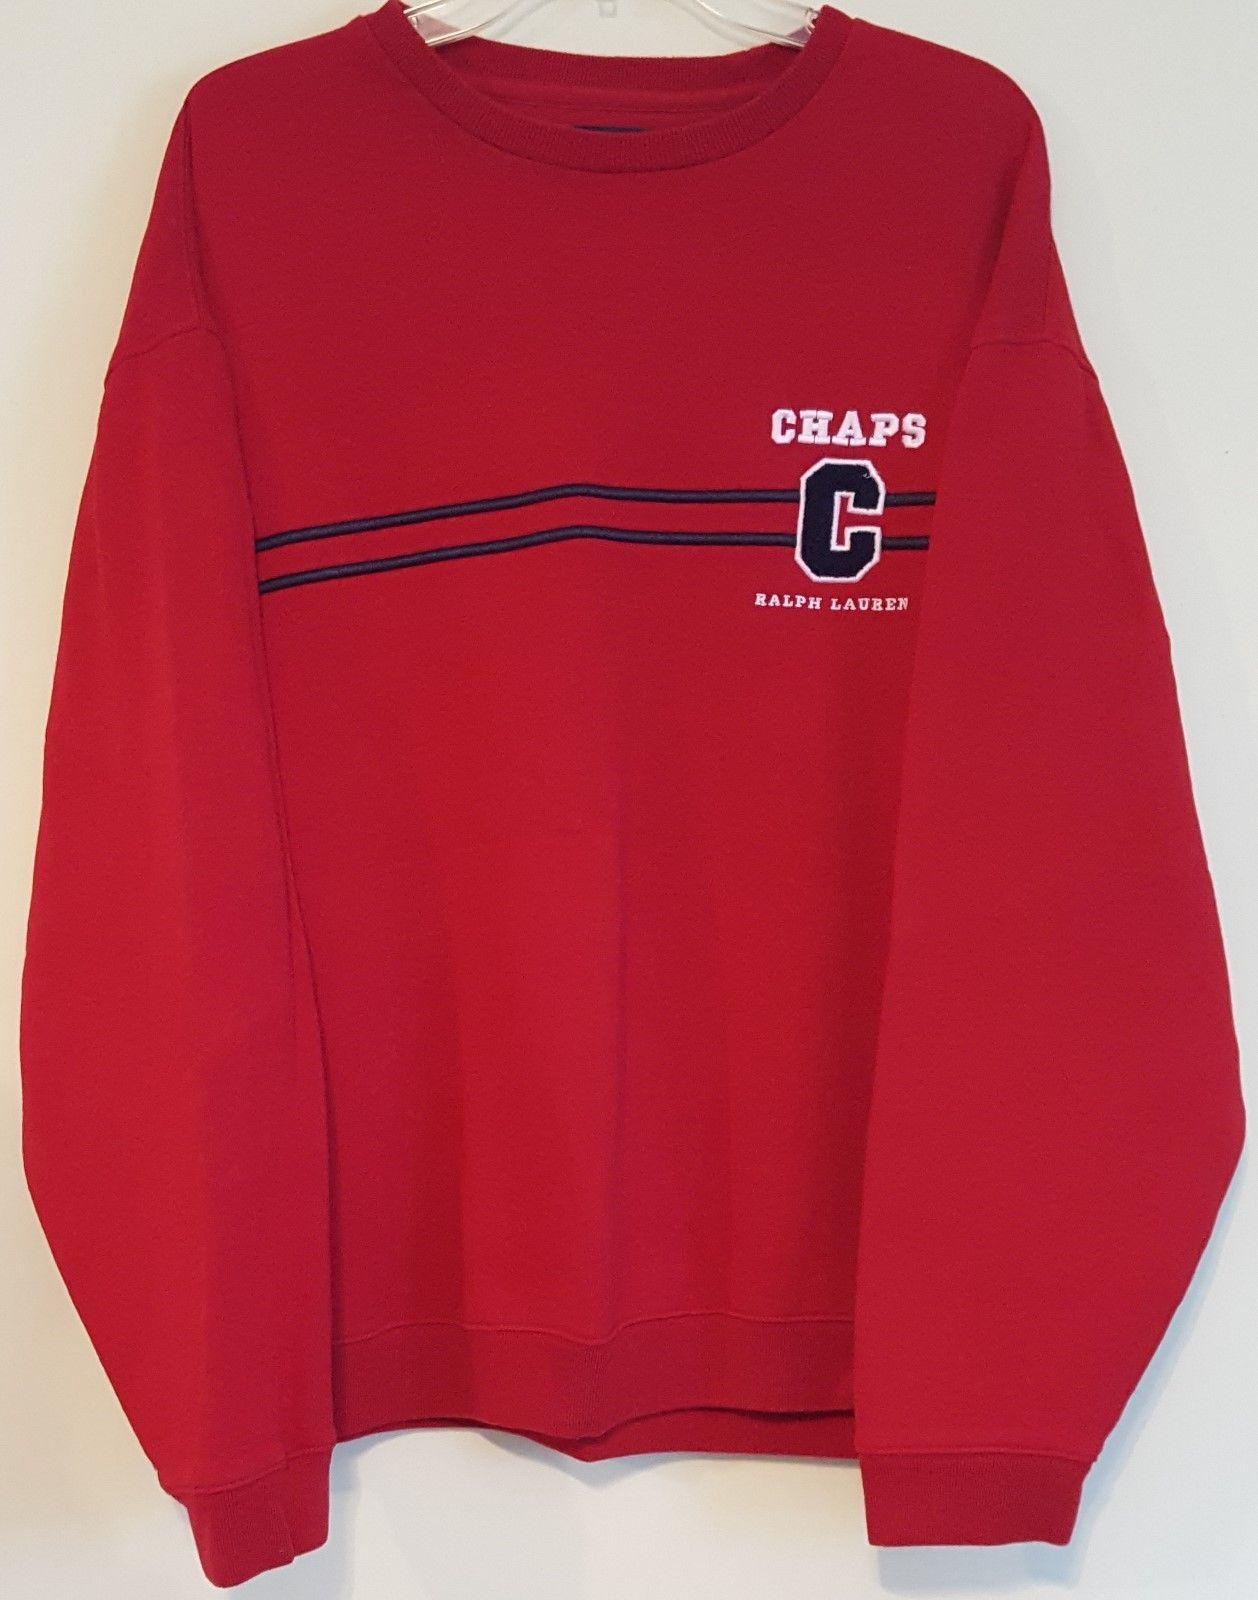 2b4df1785409a Crl Chaps Ralph Lauren WPL-125 Men s Red and 50 similar items. S l1600